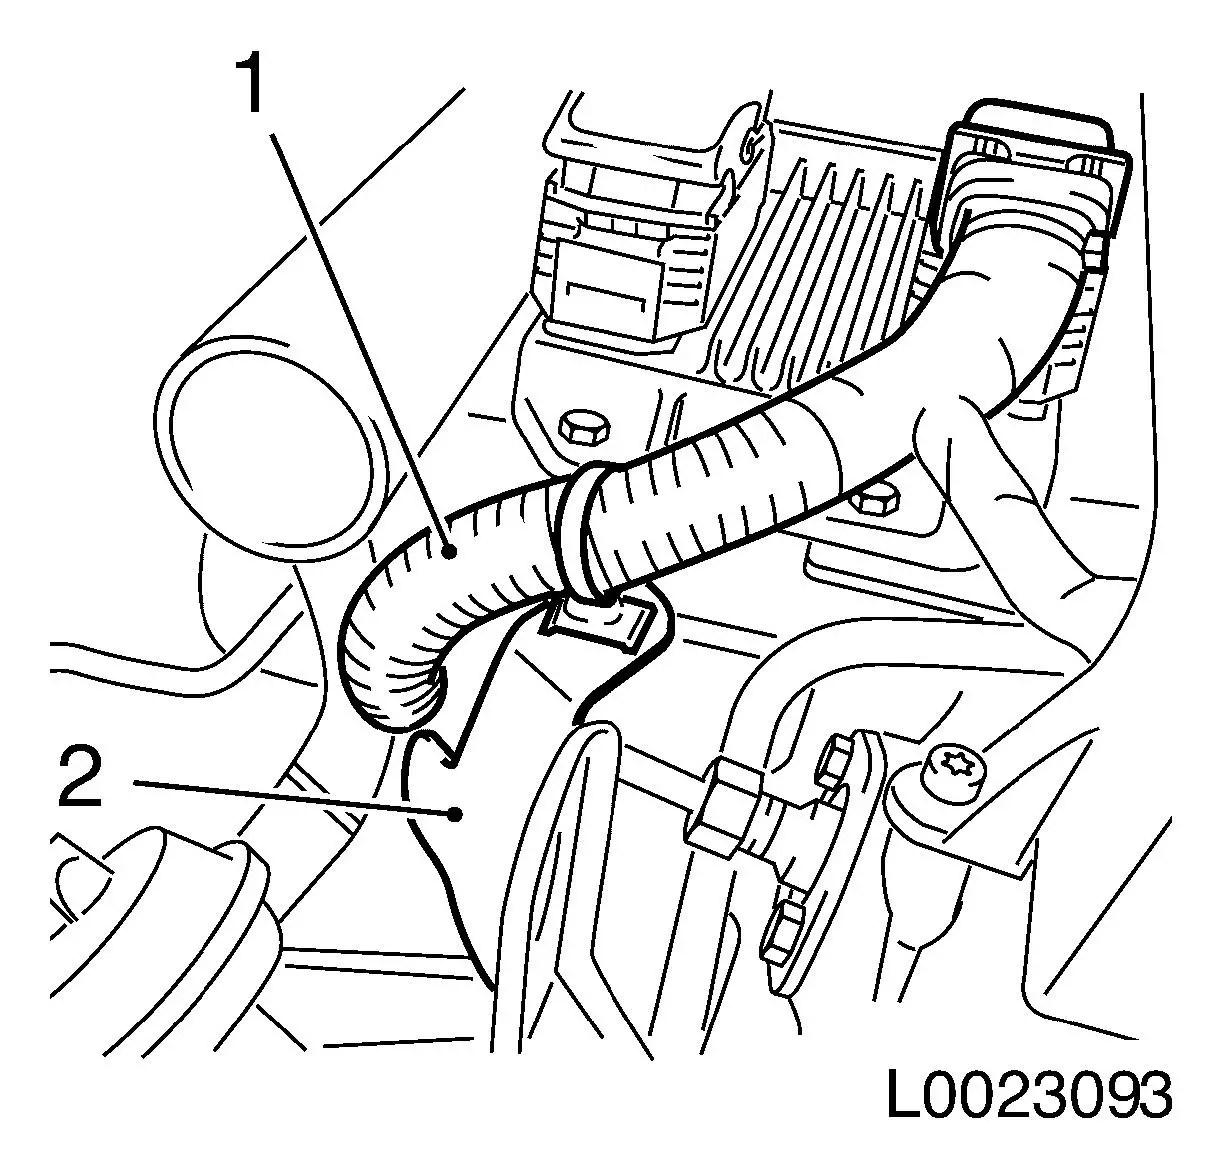 Vauxhall Workshop Manuals Gt Corsa C Gt J Engine And Engine Aggregates Gt Dohcsel Engine Gt Fuel